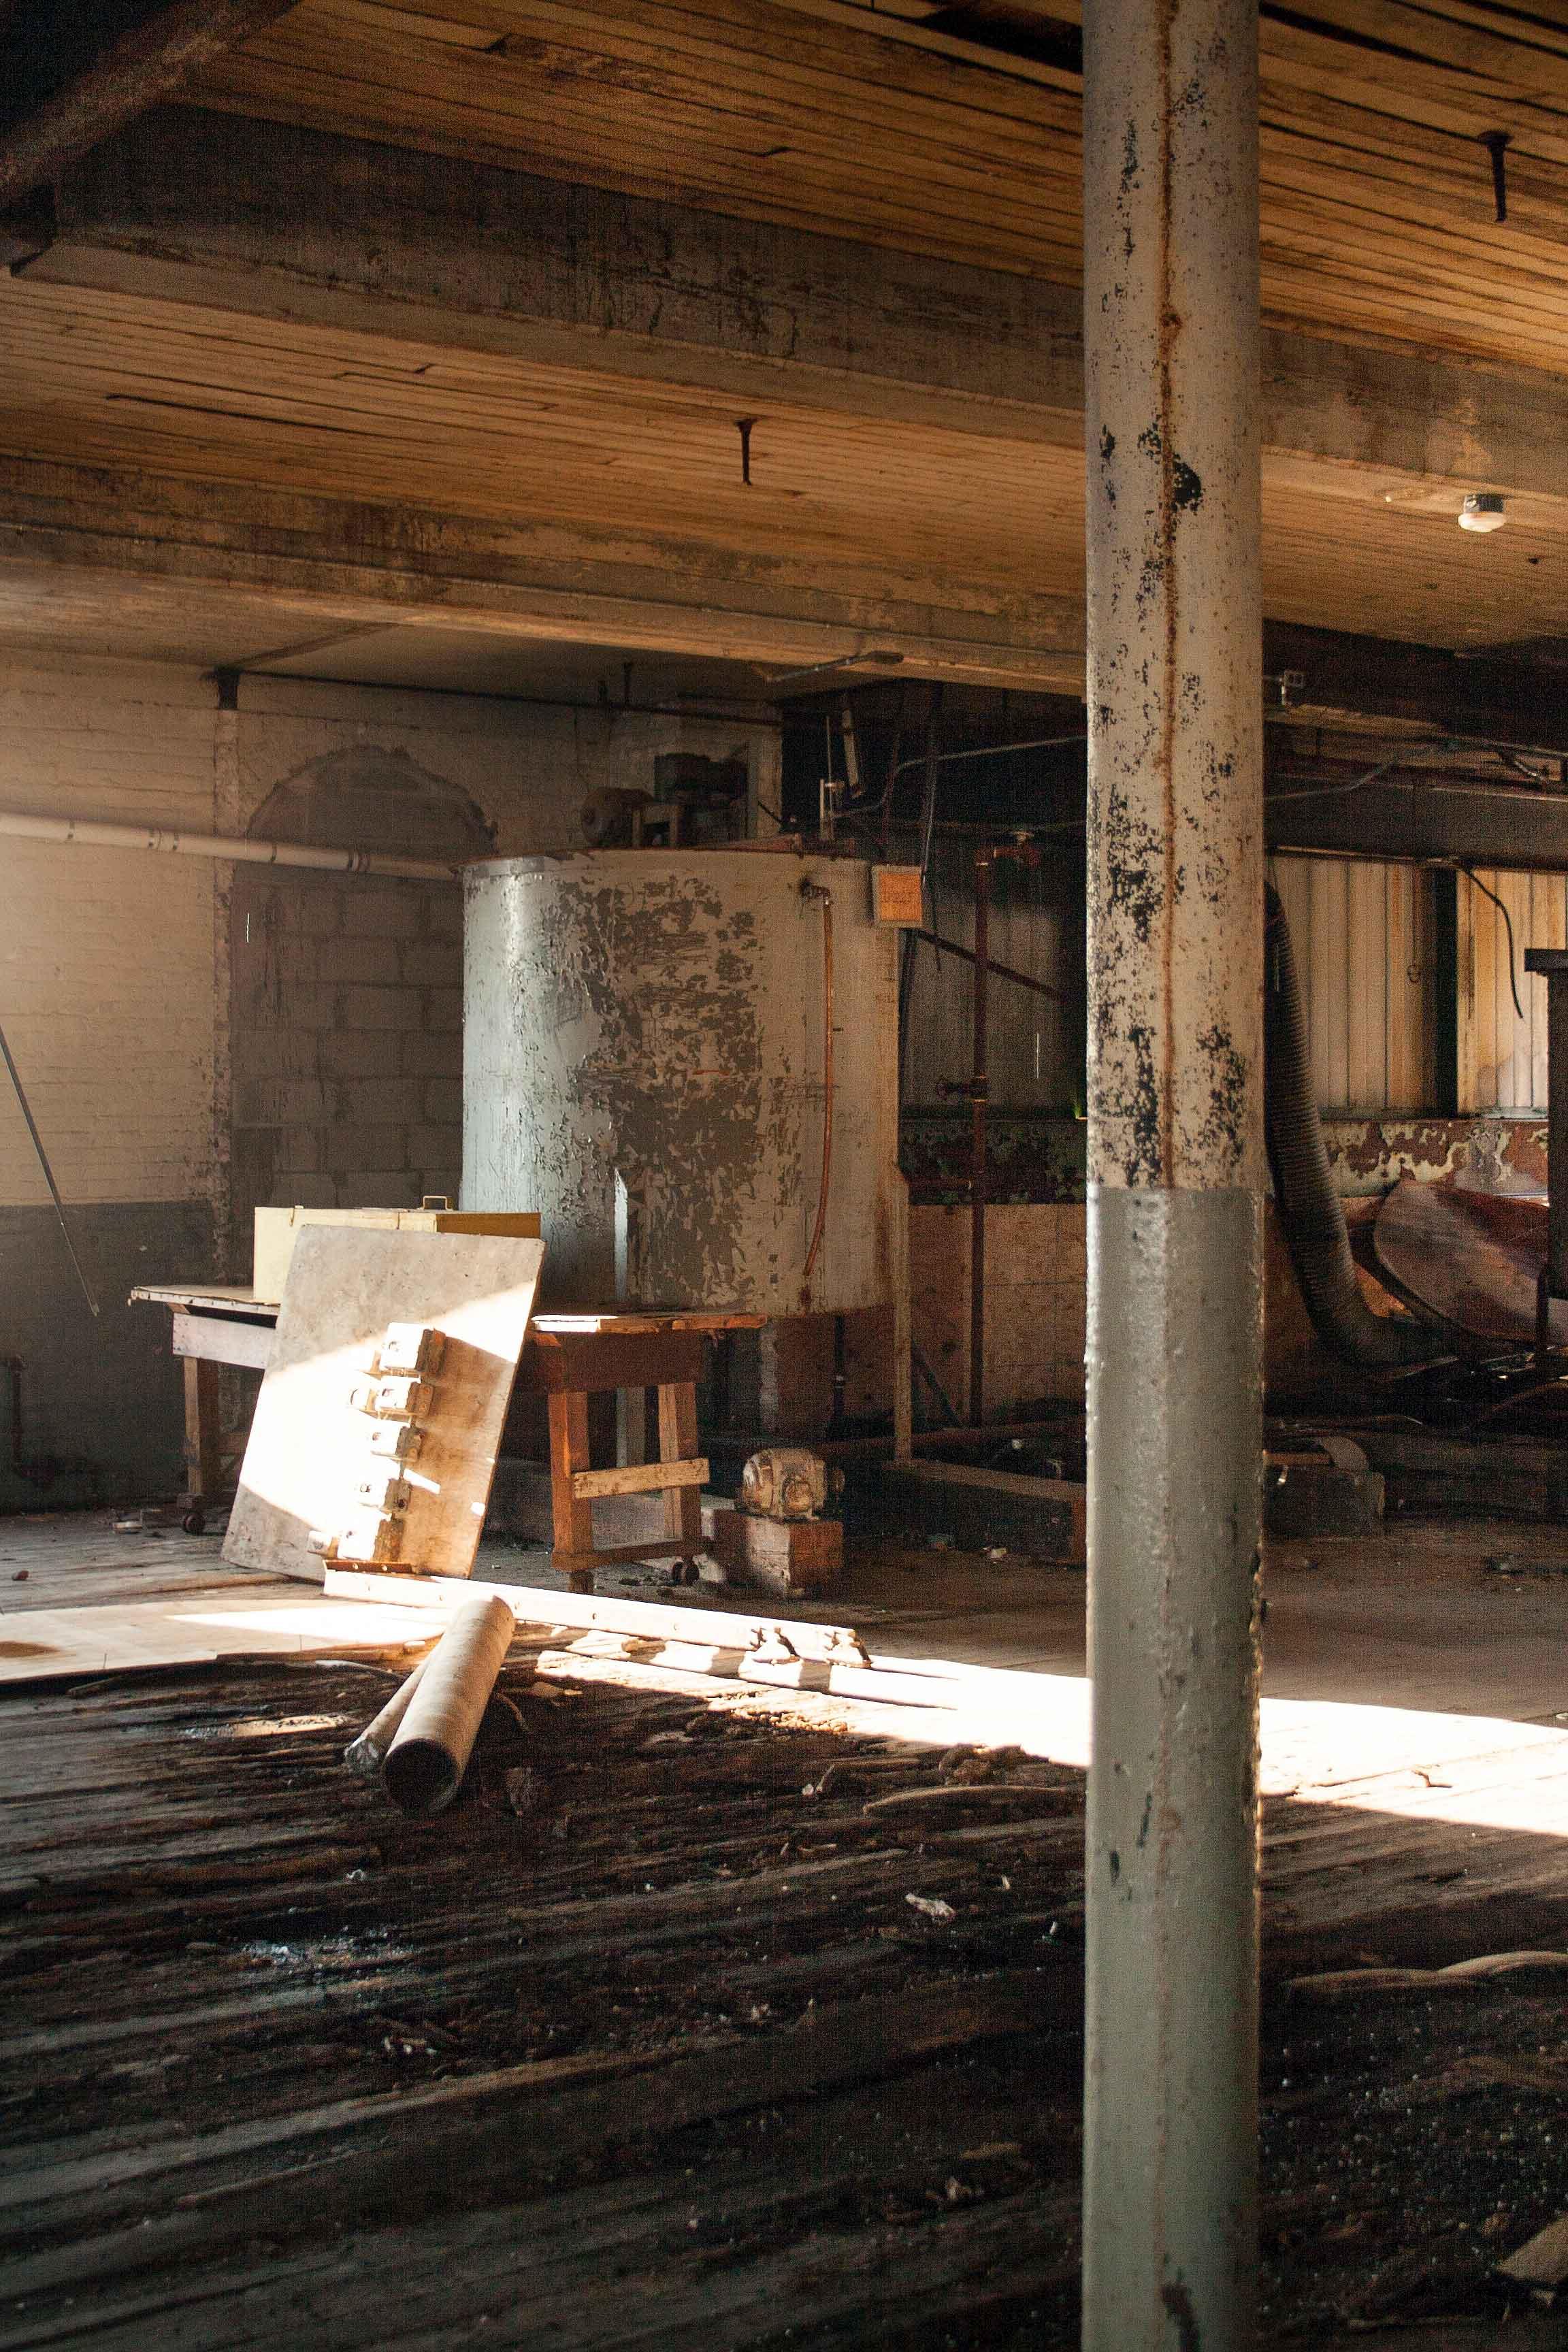 Longleaf Lumber Texon Mill Building